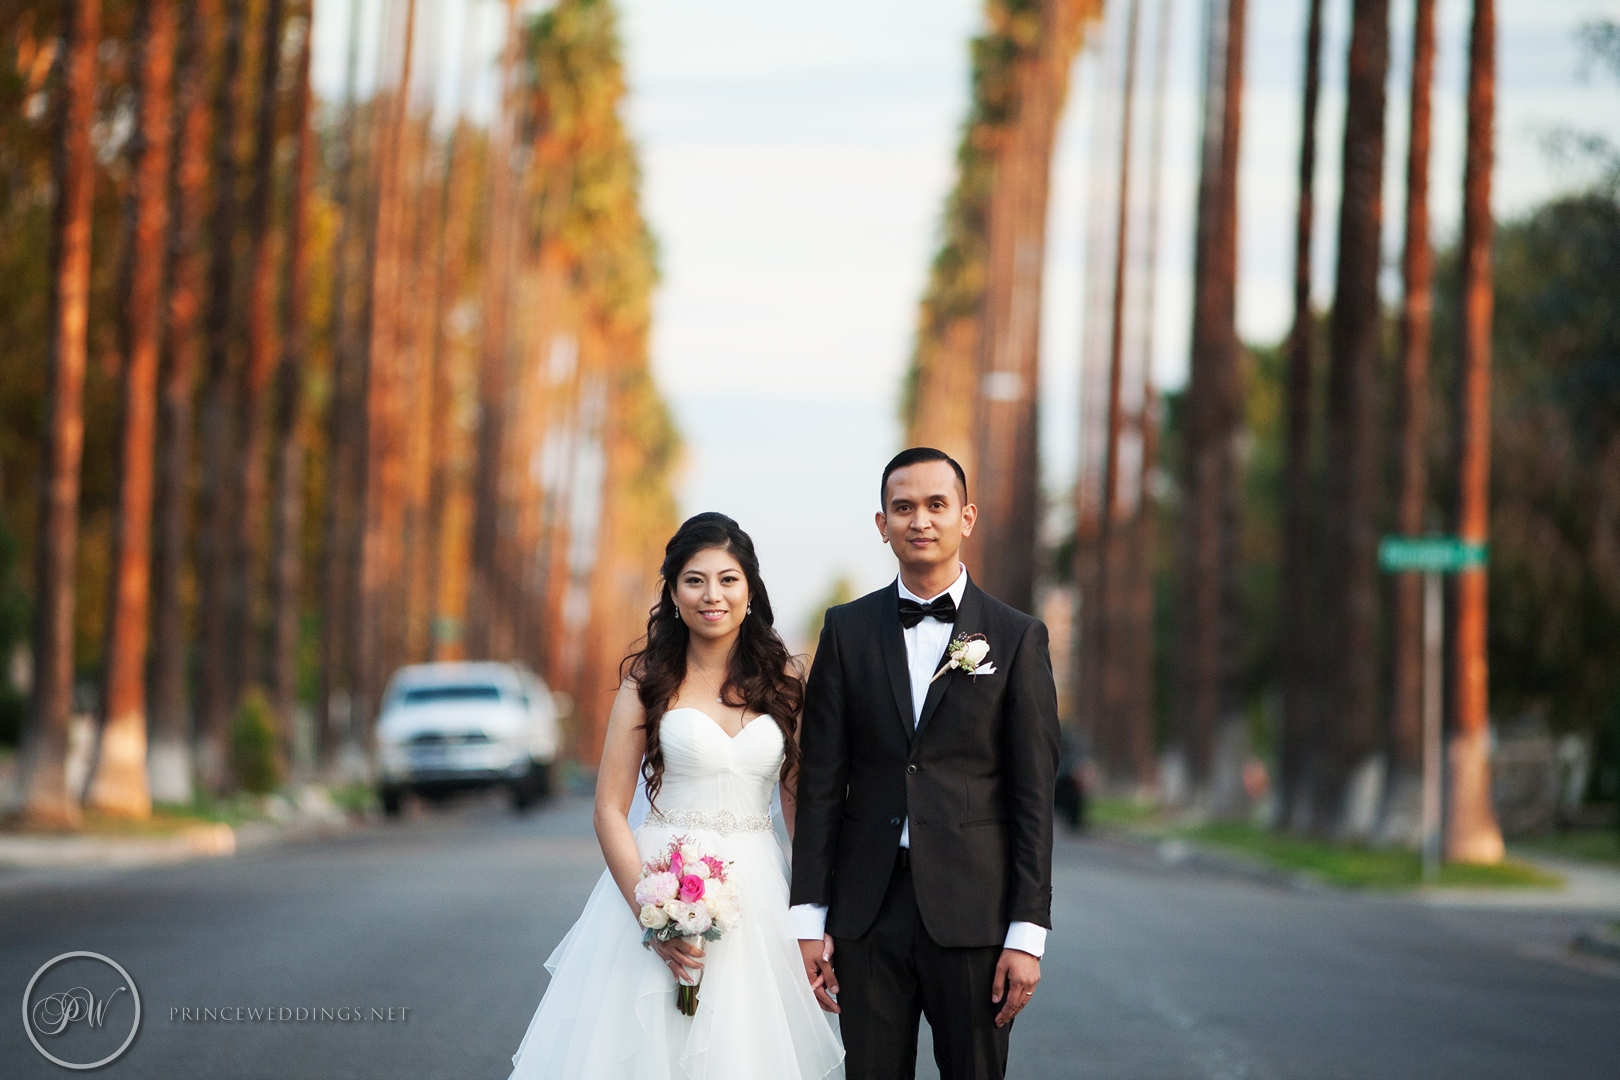 Castaway_Burbank_Wedding_Photo_Christian_Autumn058.jpg